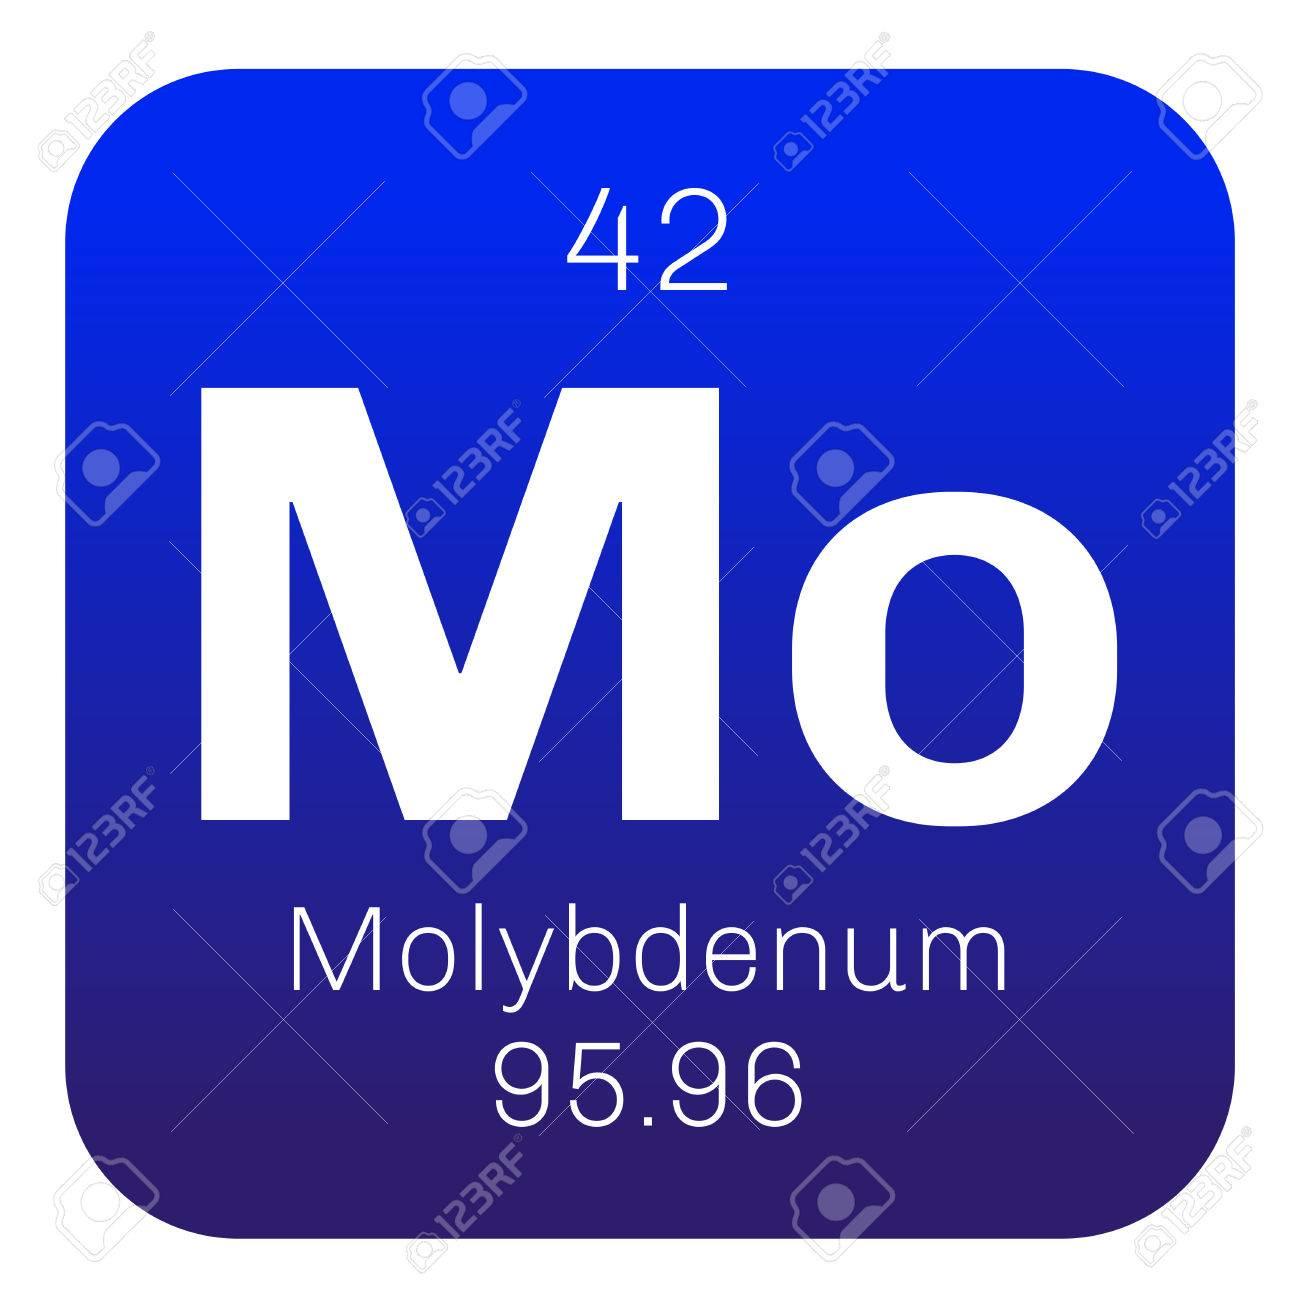 Molybdenum chemical element has sixth highest melting point molybdenum chemical element has sixth highest melting point of all elements colored icon urtaz Gallery